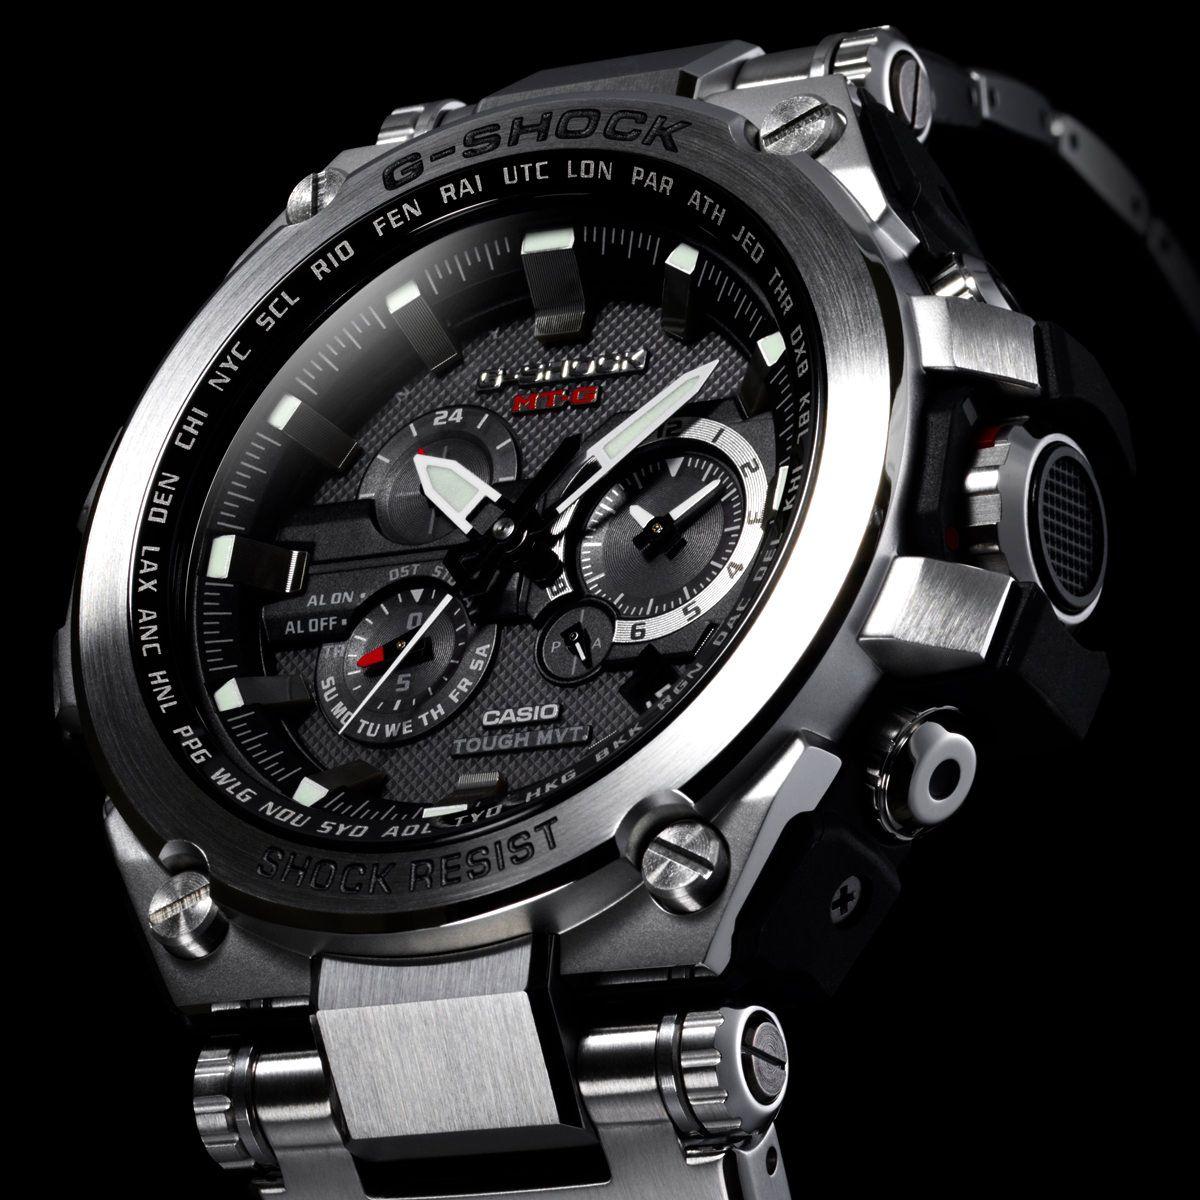 6862399ca9 Casio G Shock - Top 10 Casio G-Shock Watches for Men in India